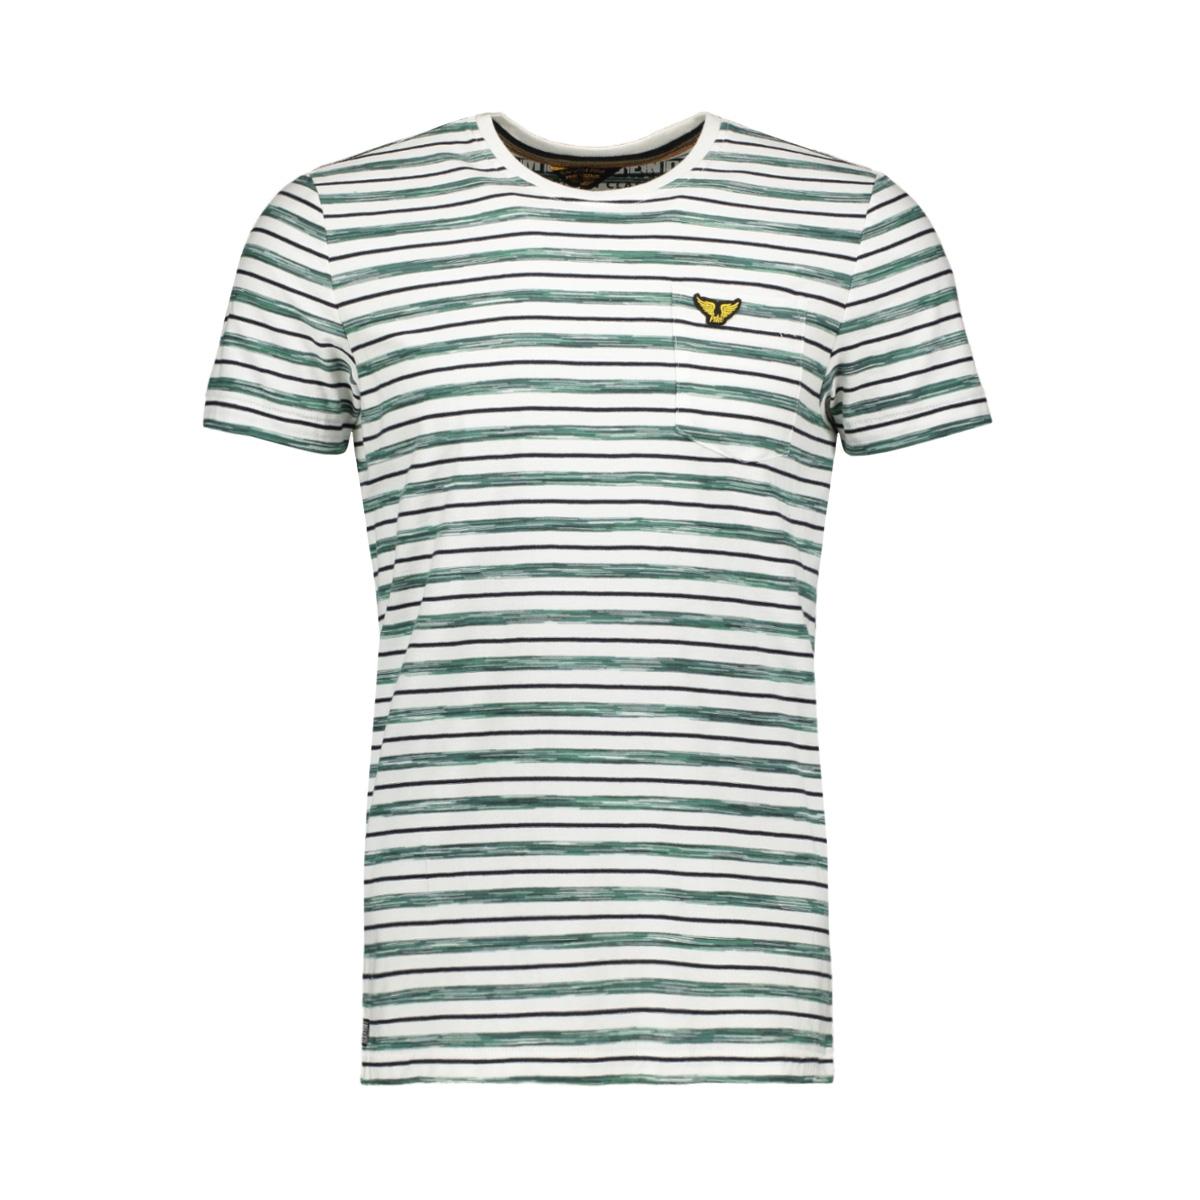 ptss191518 pme legend t-shirt 6082